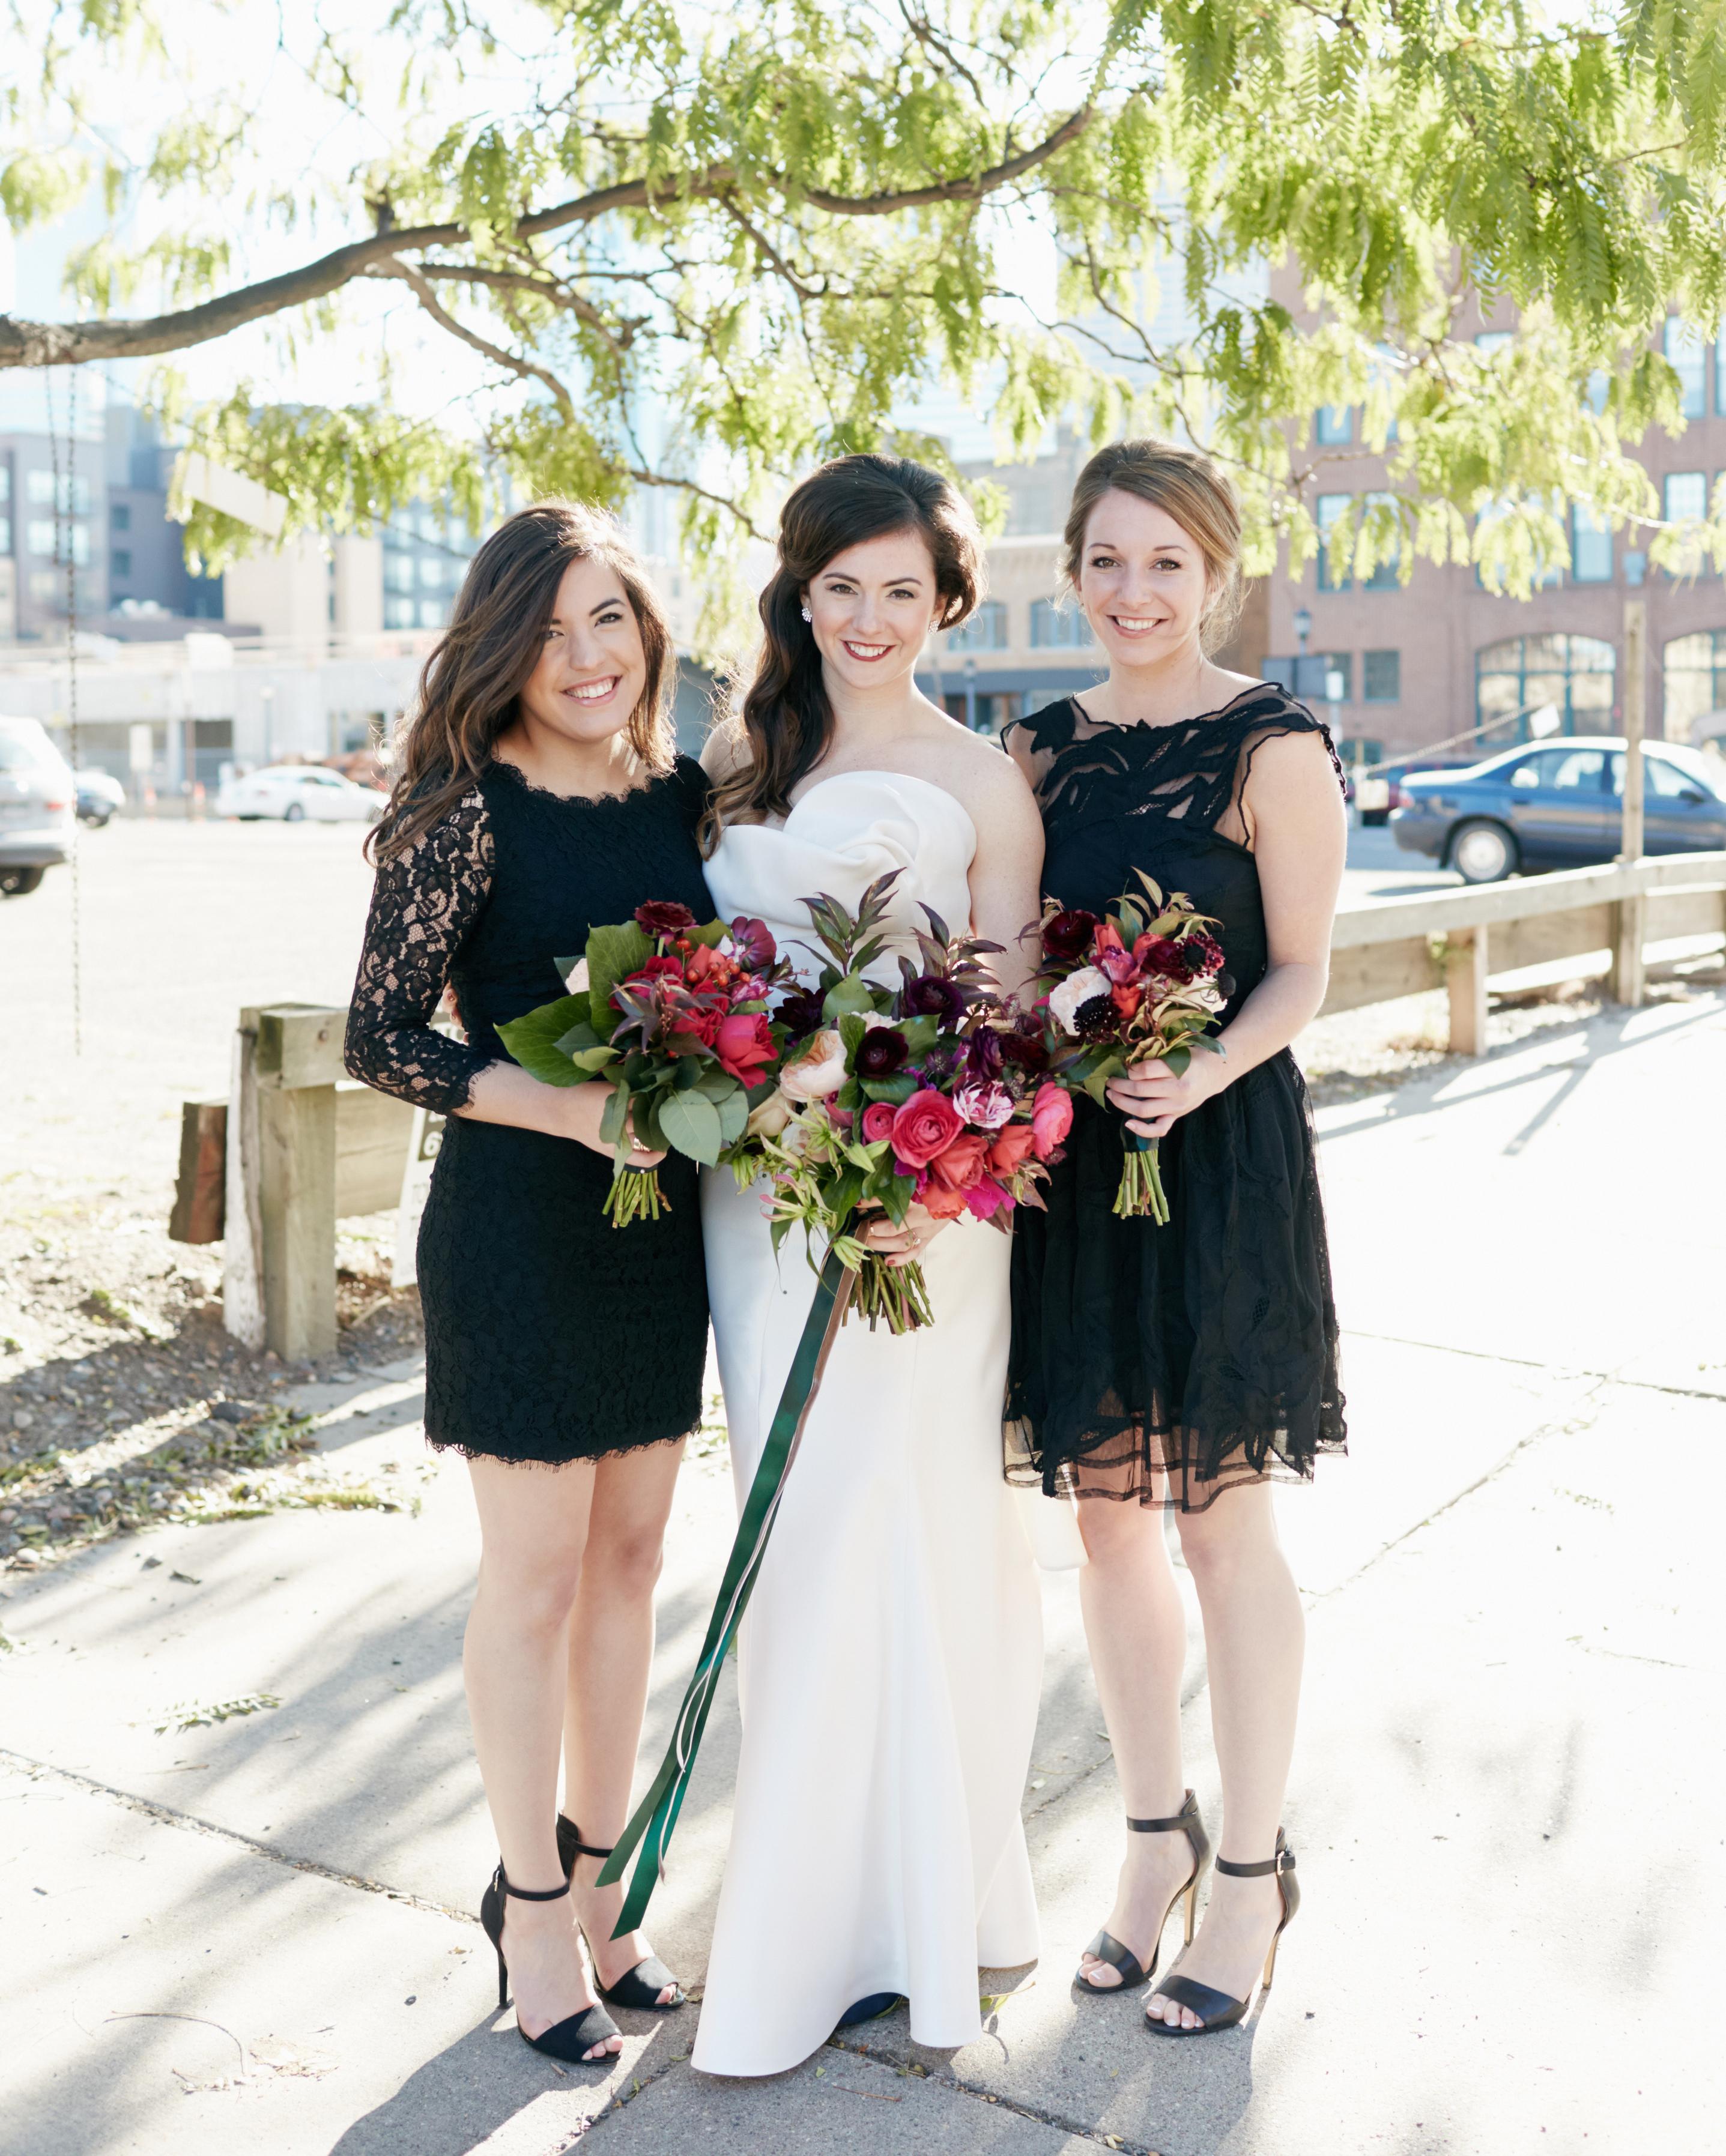 kate-joe-wedding-bridesmaids-0237-s111816-0215.jpg